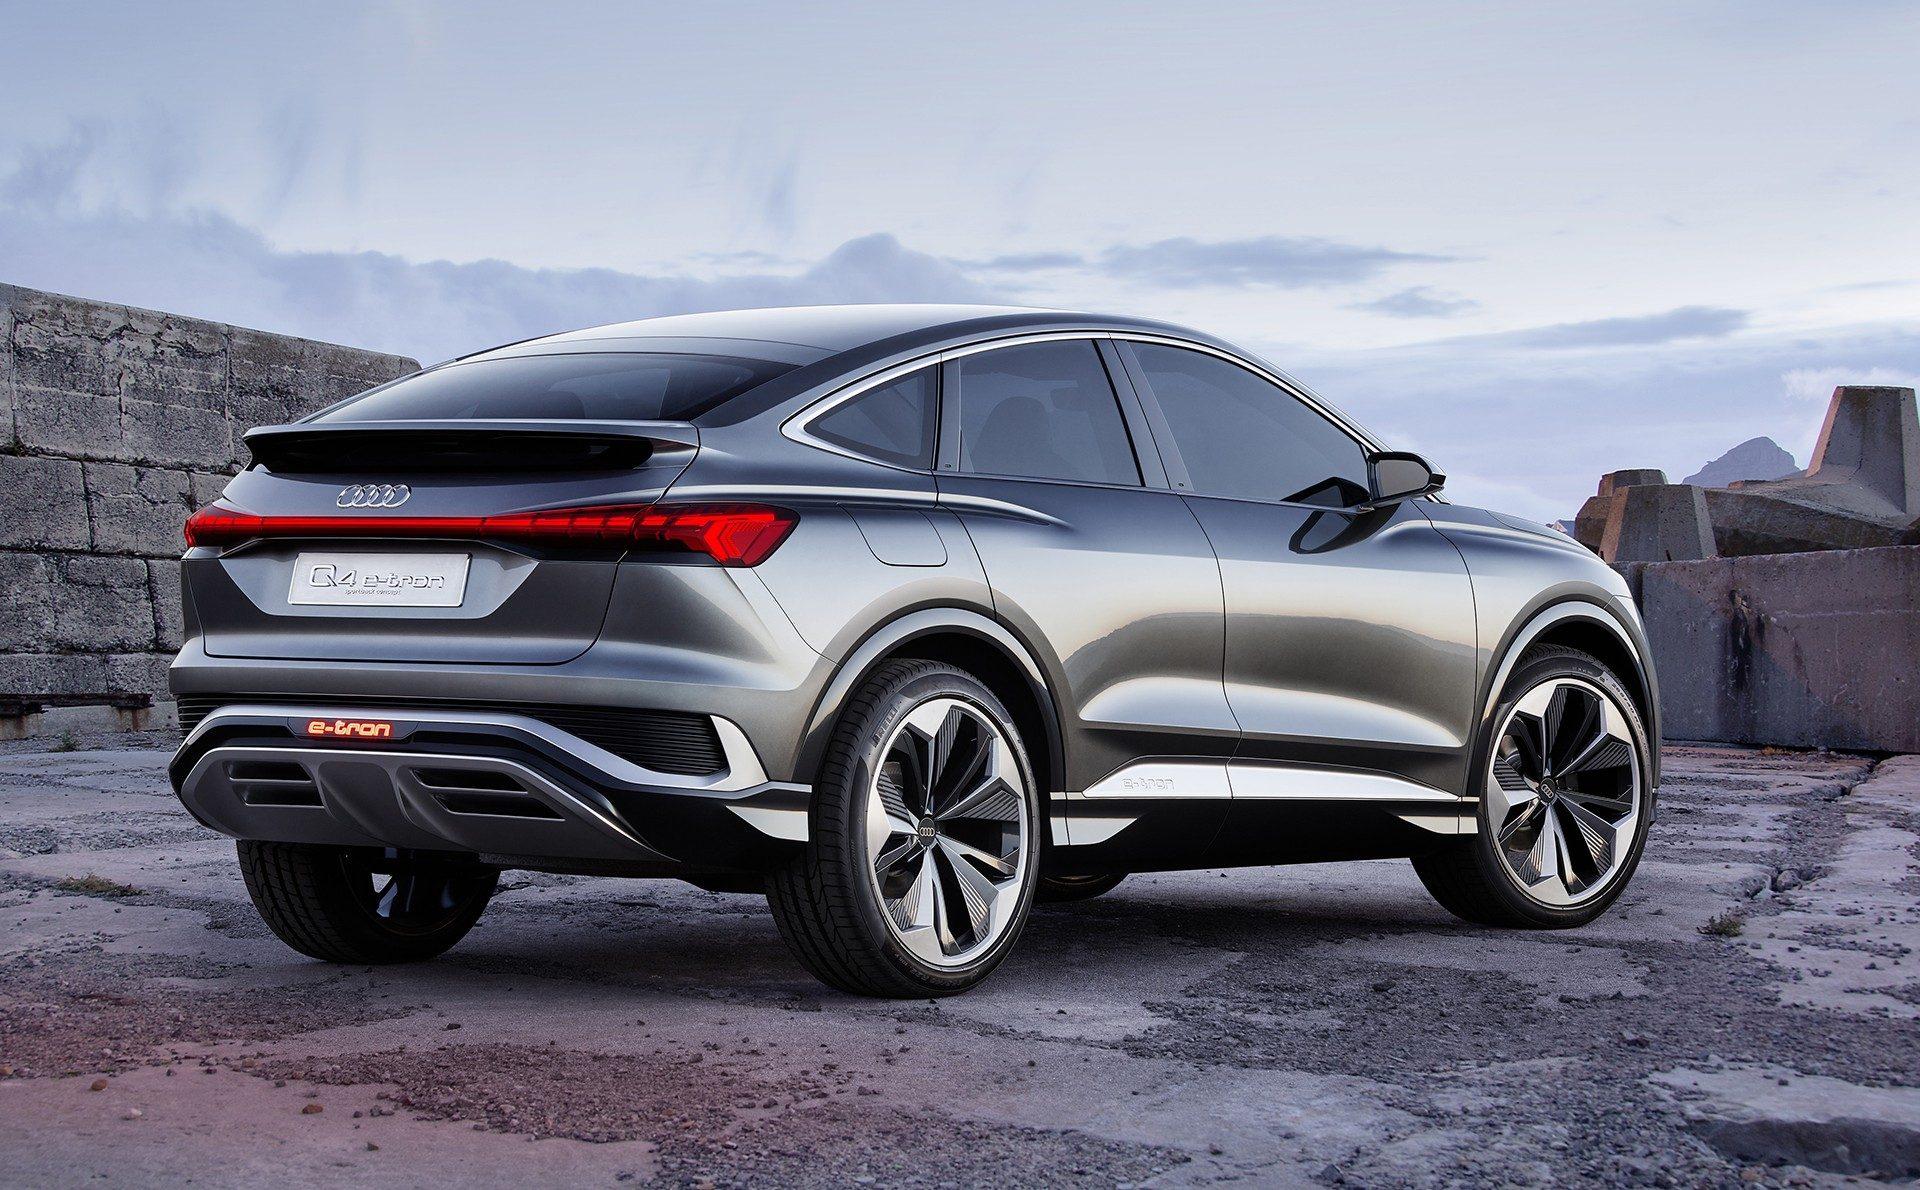 Audi Q4 E-Tron, 2021 BMW M4, 2020 Polaris Slingshot R